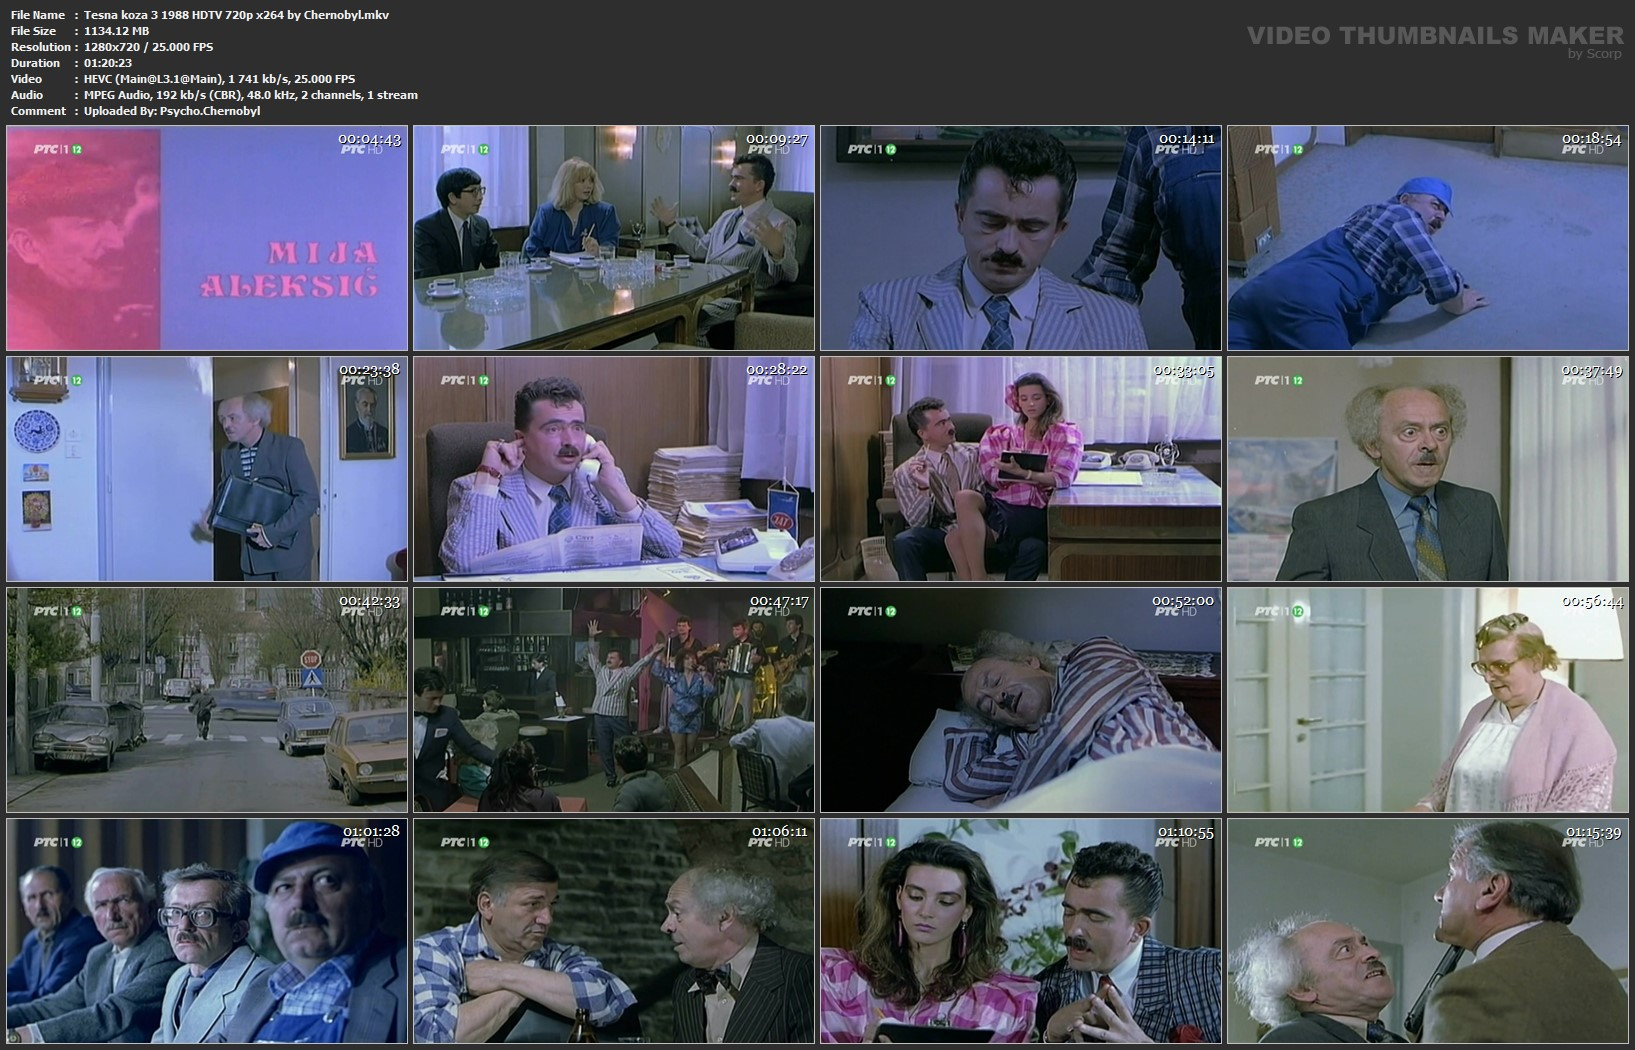 Tesna-koza-3-1988-HDTV-720p-x264-by-Cher